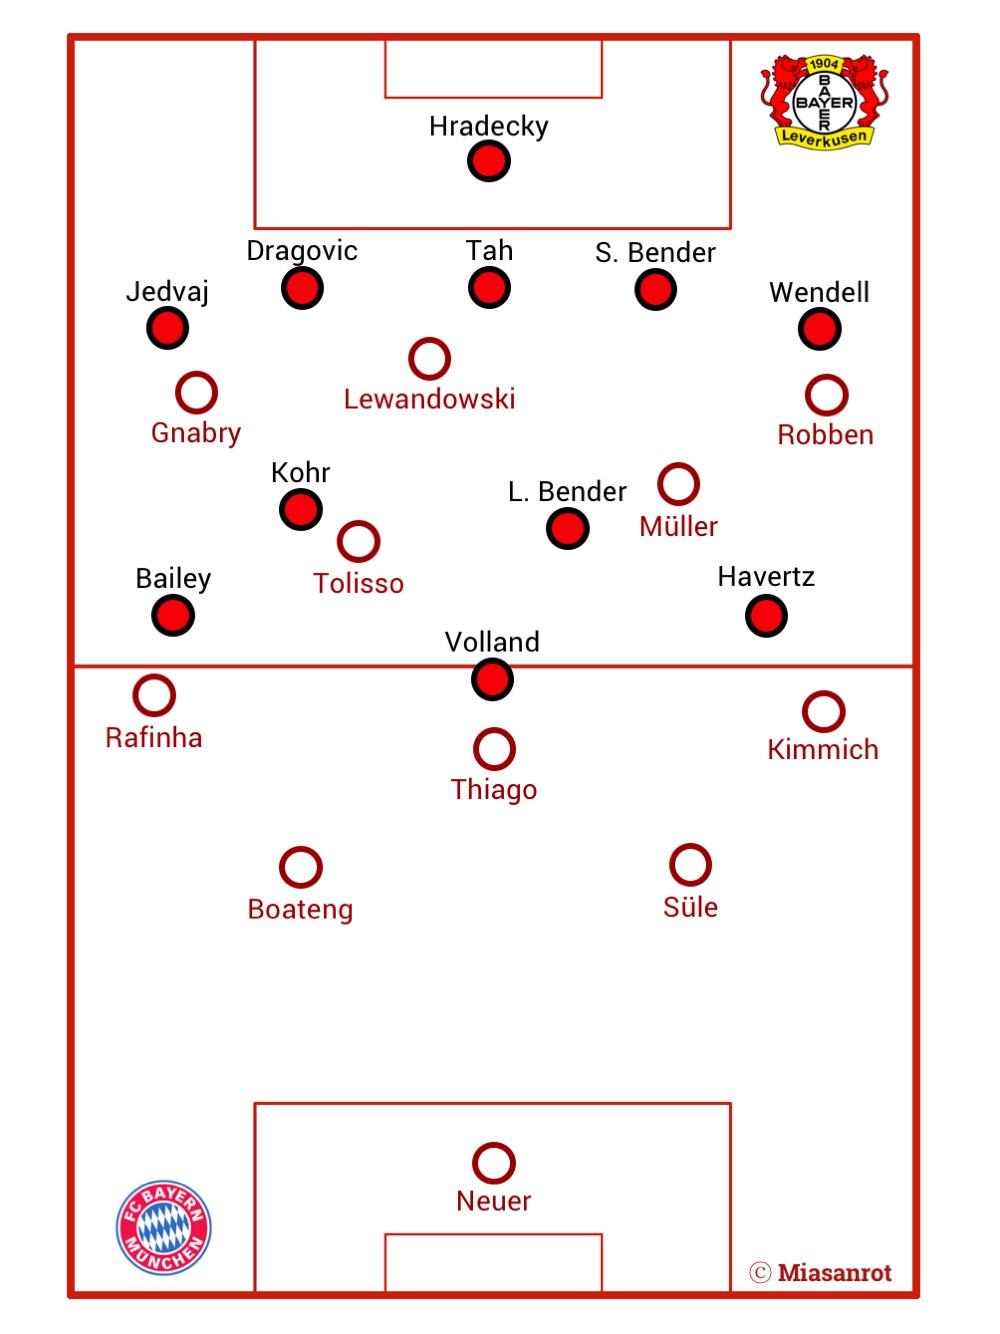 FC Bayern München vs. Leverkusen